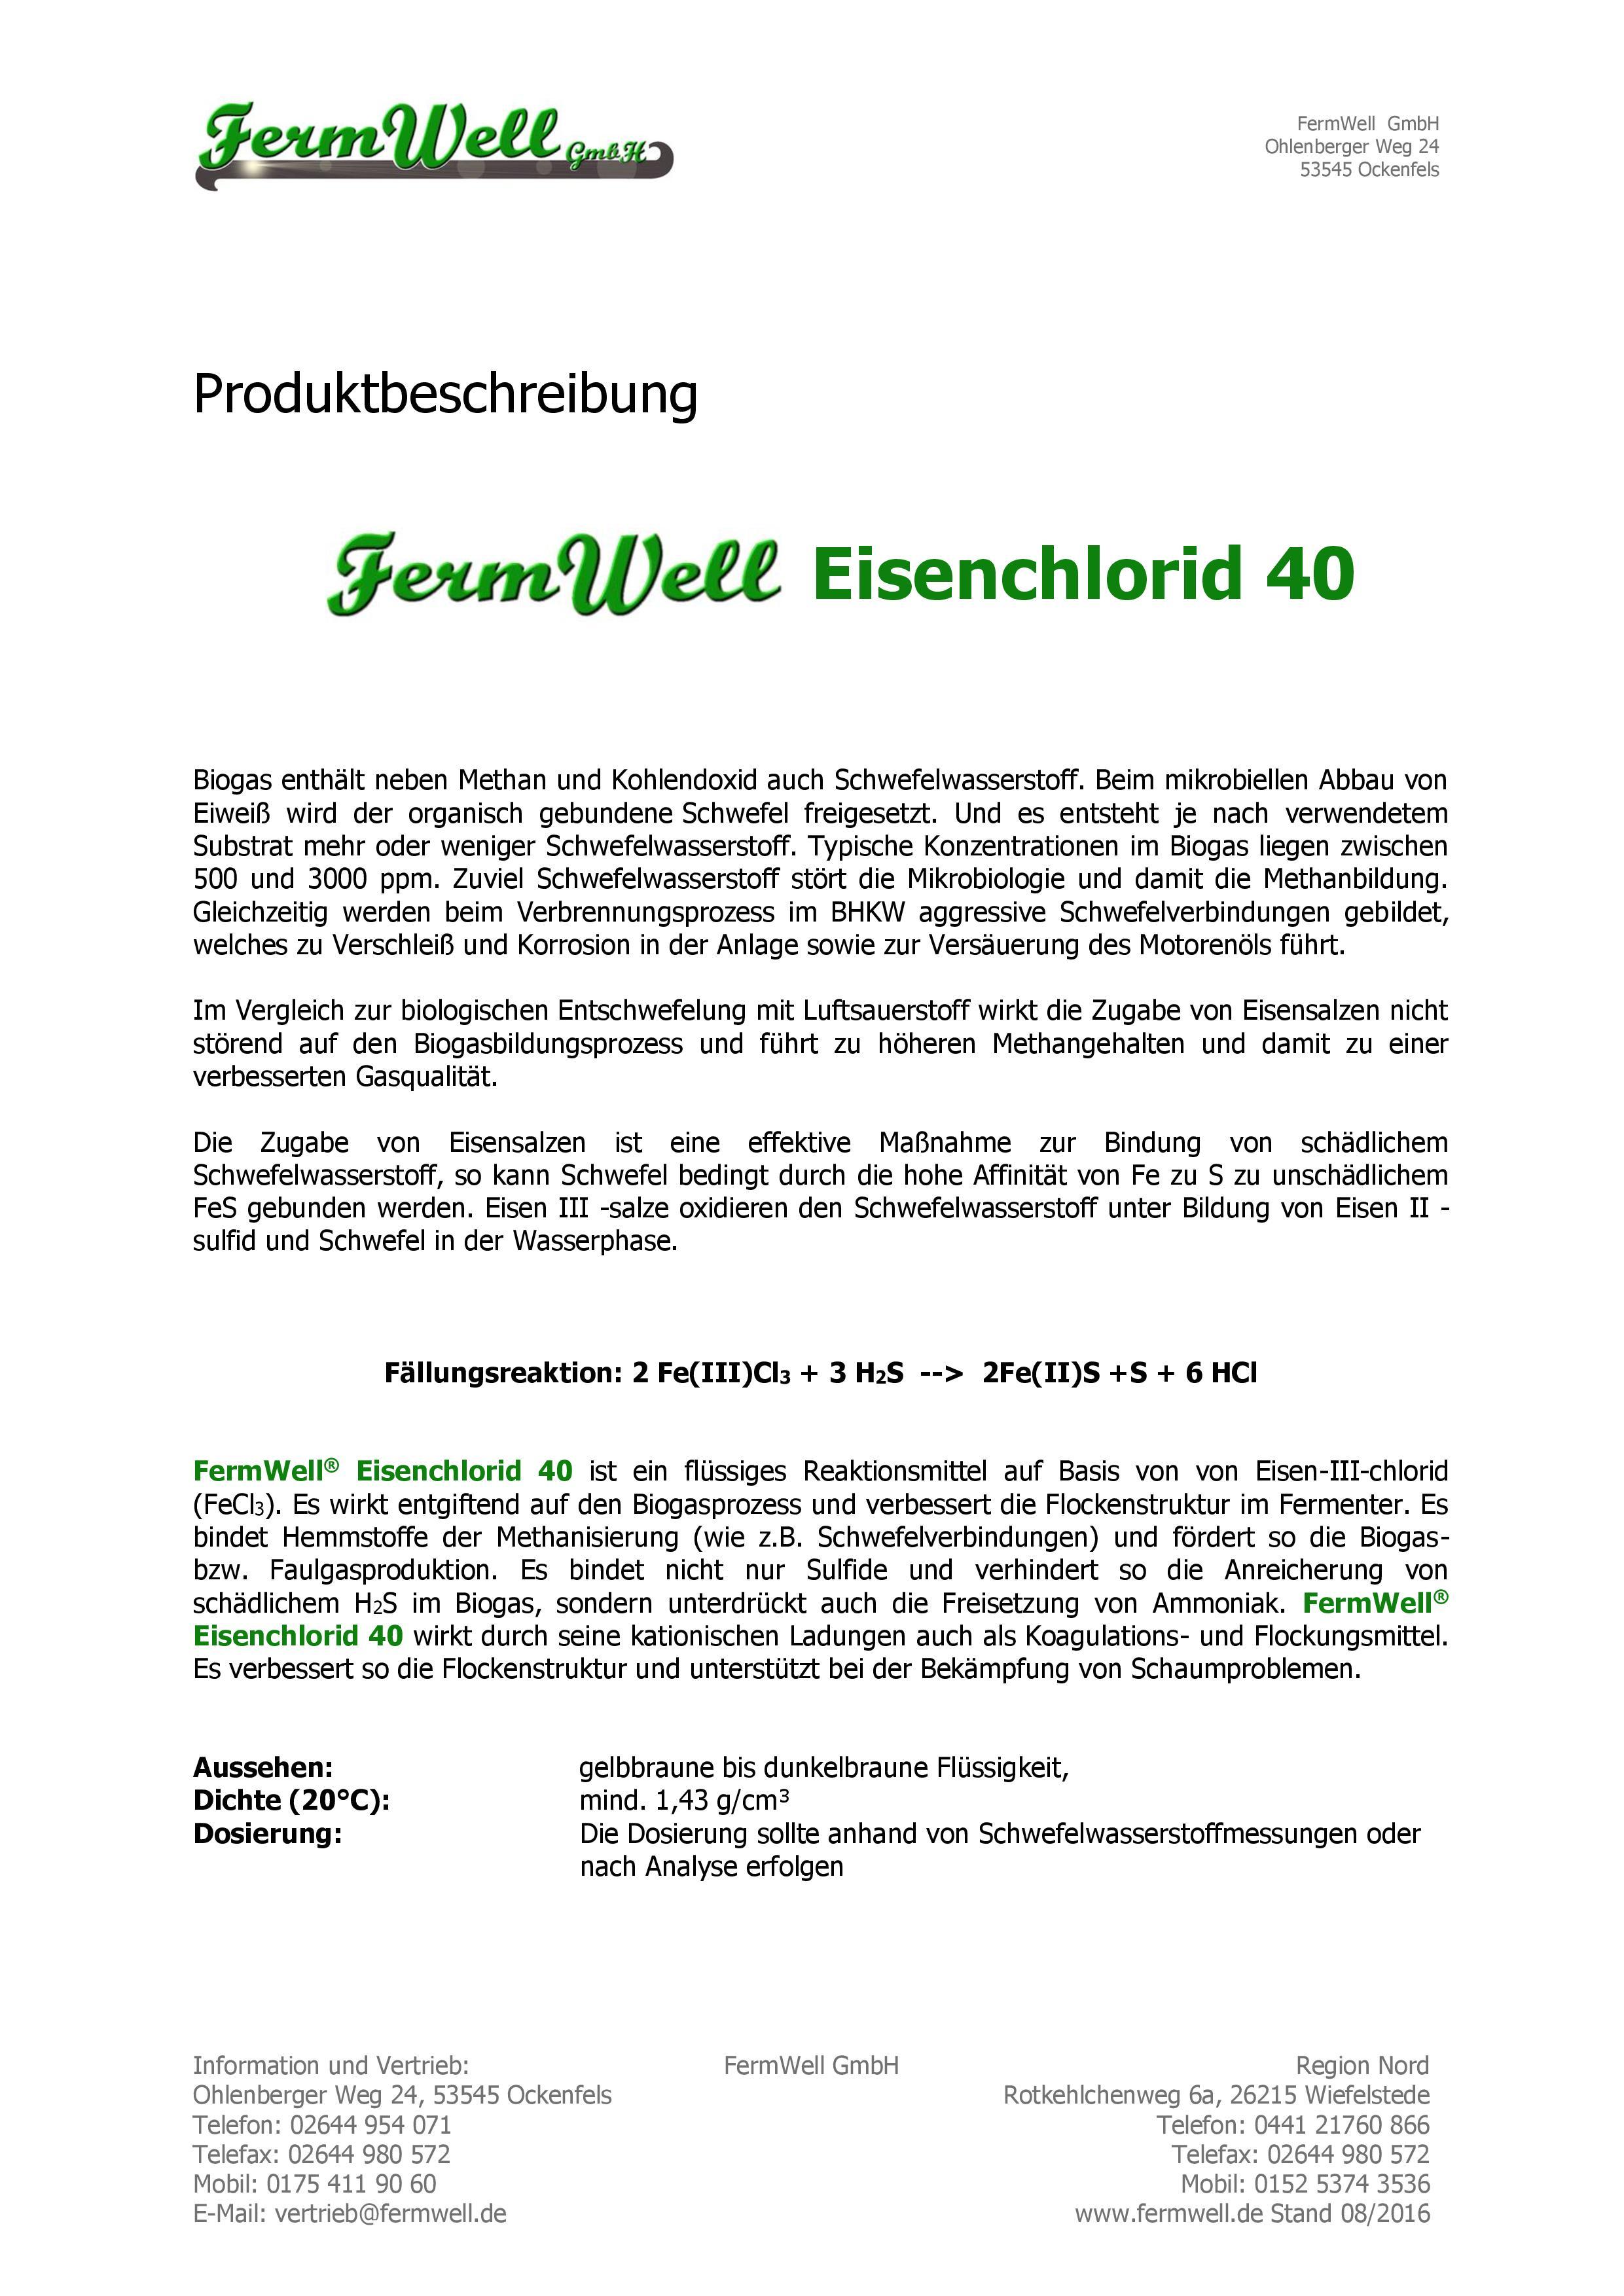 FWG_Eisenchlorid_40_Produktbeschreib_160